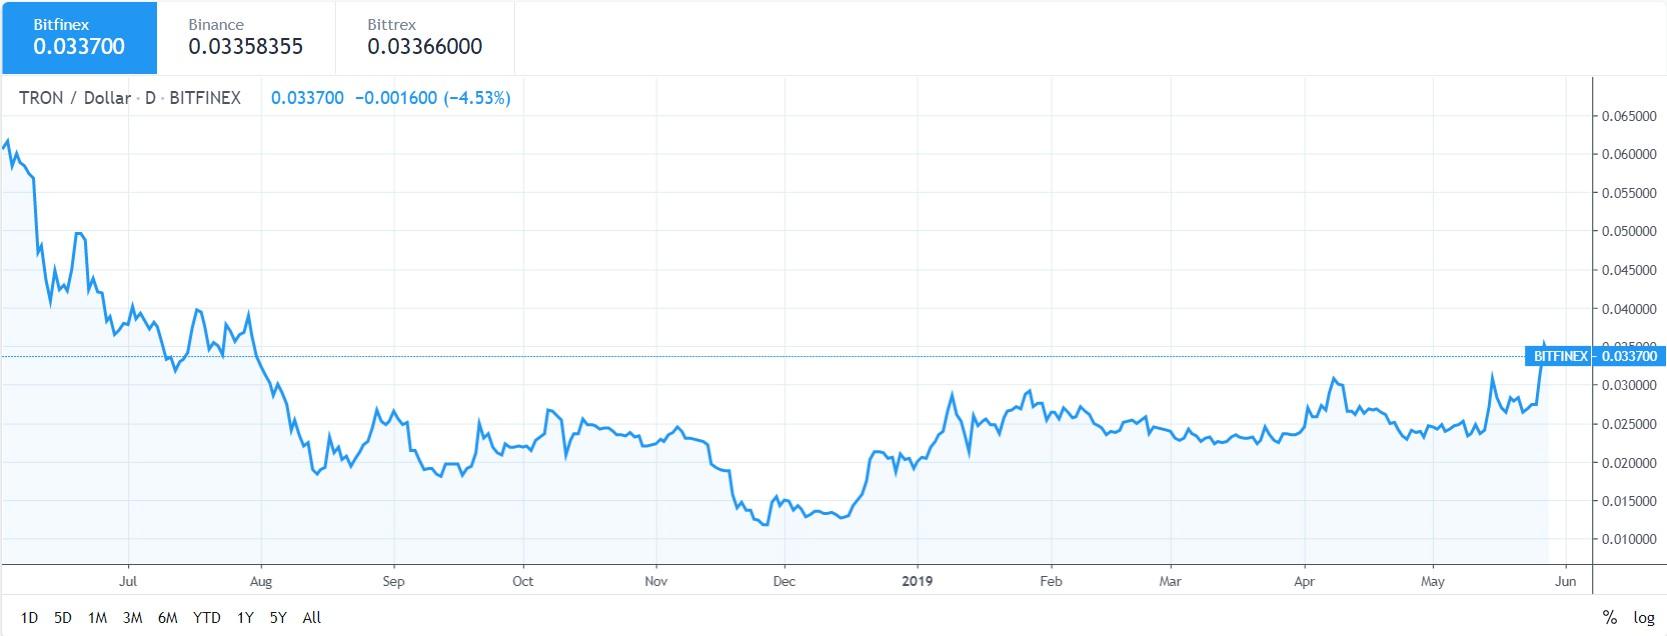 TRX price chart May 2019